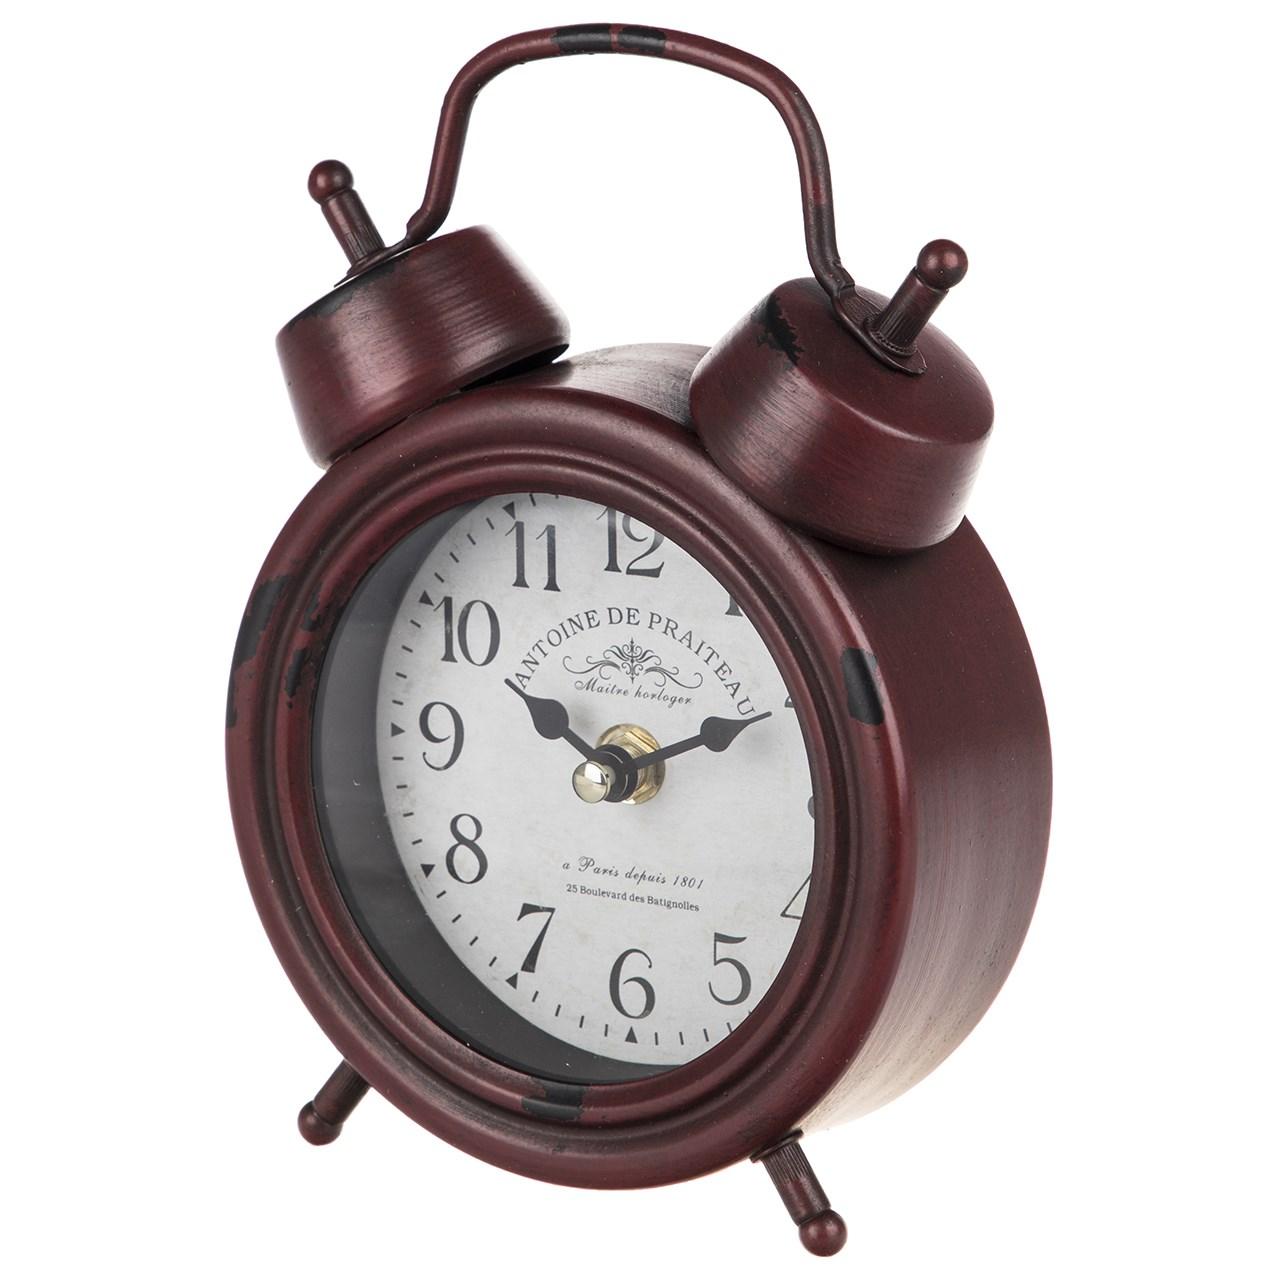 ساعت رومیزی مدل D-15-3